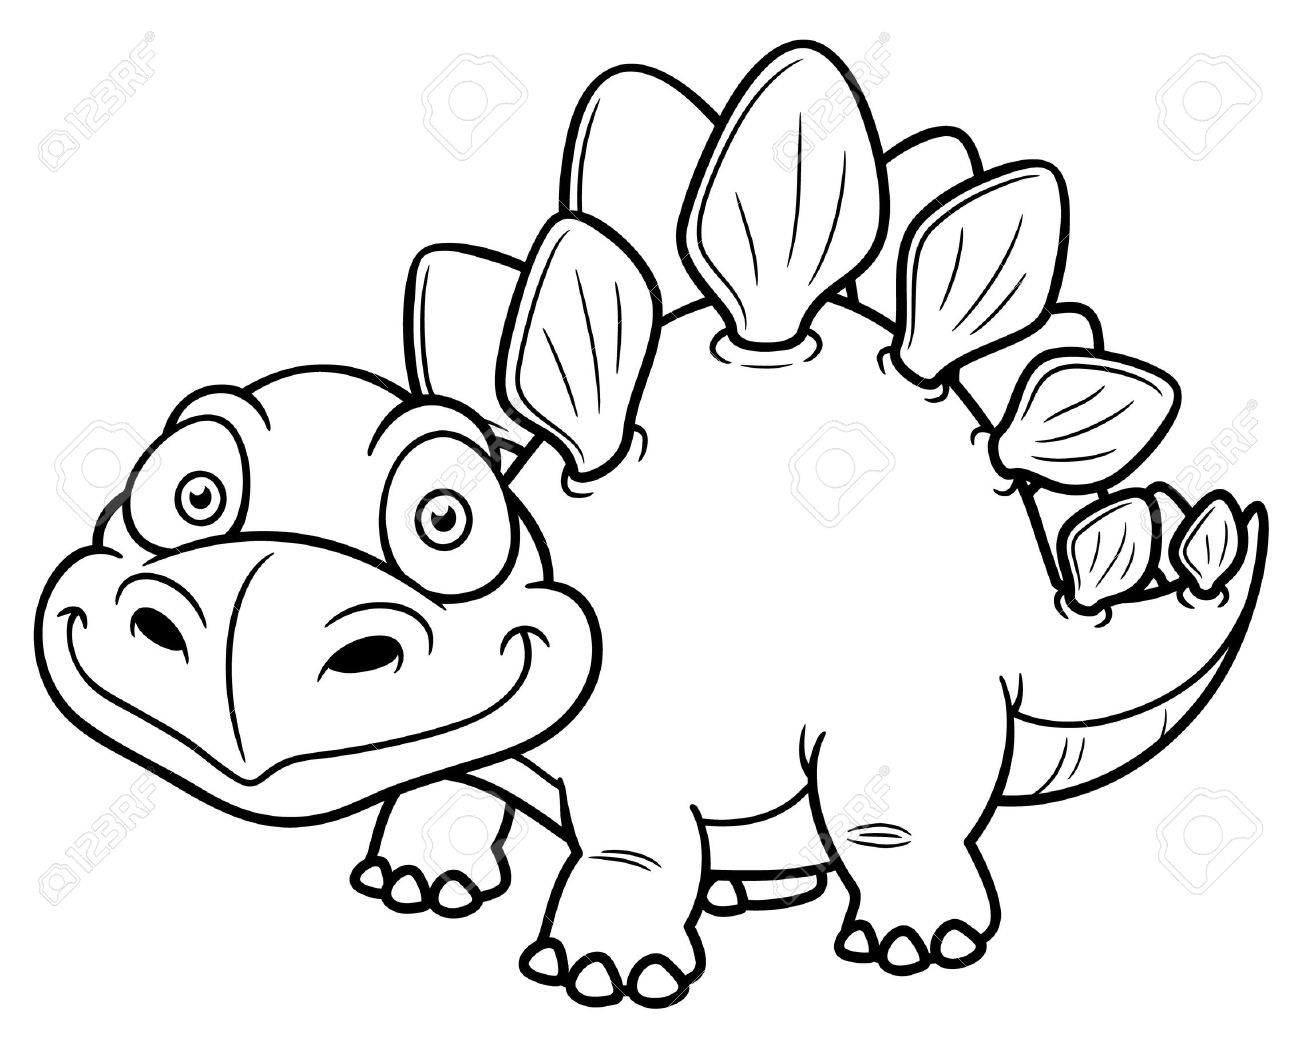 Vector Illustration Of Cartoon Dinosaur - Coloring Book Royalty ...